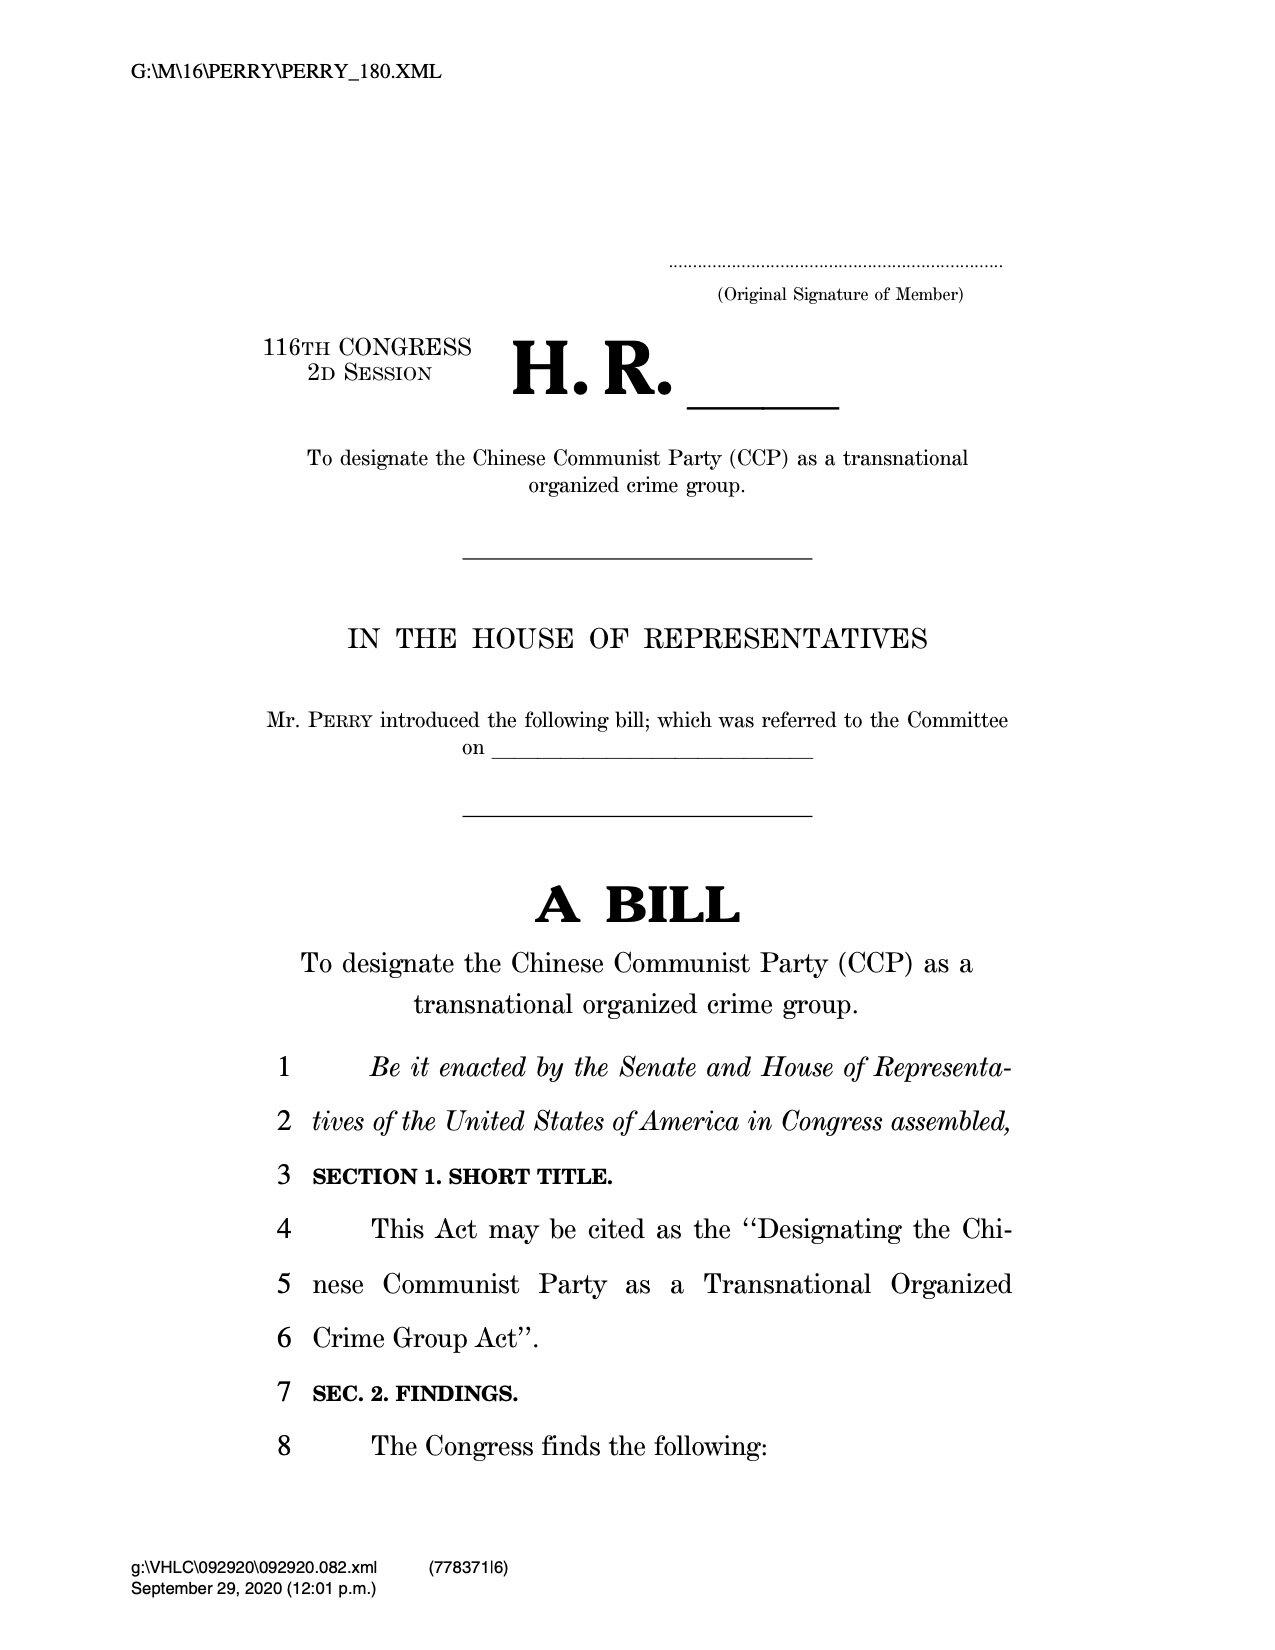 CCP as a TOC Bill - Final Edition.jpg